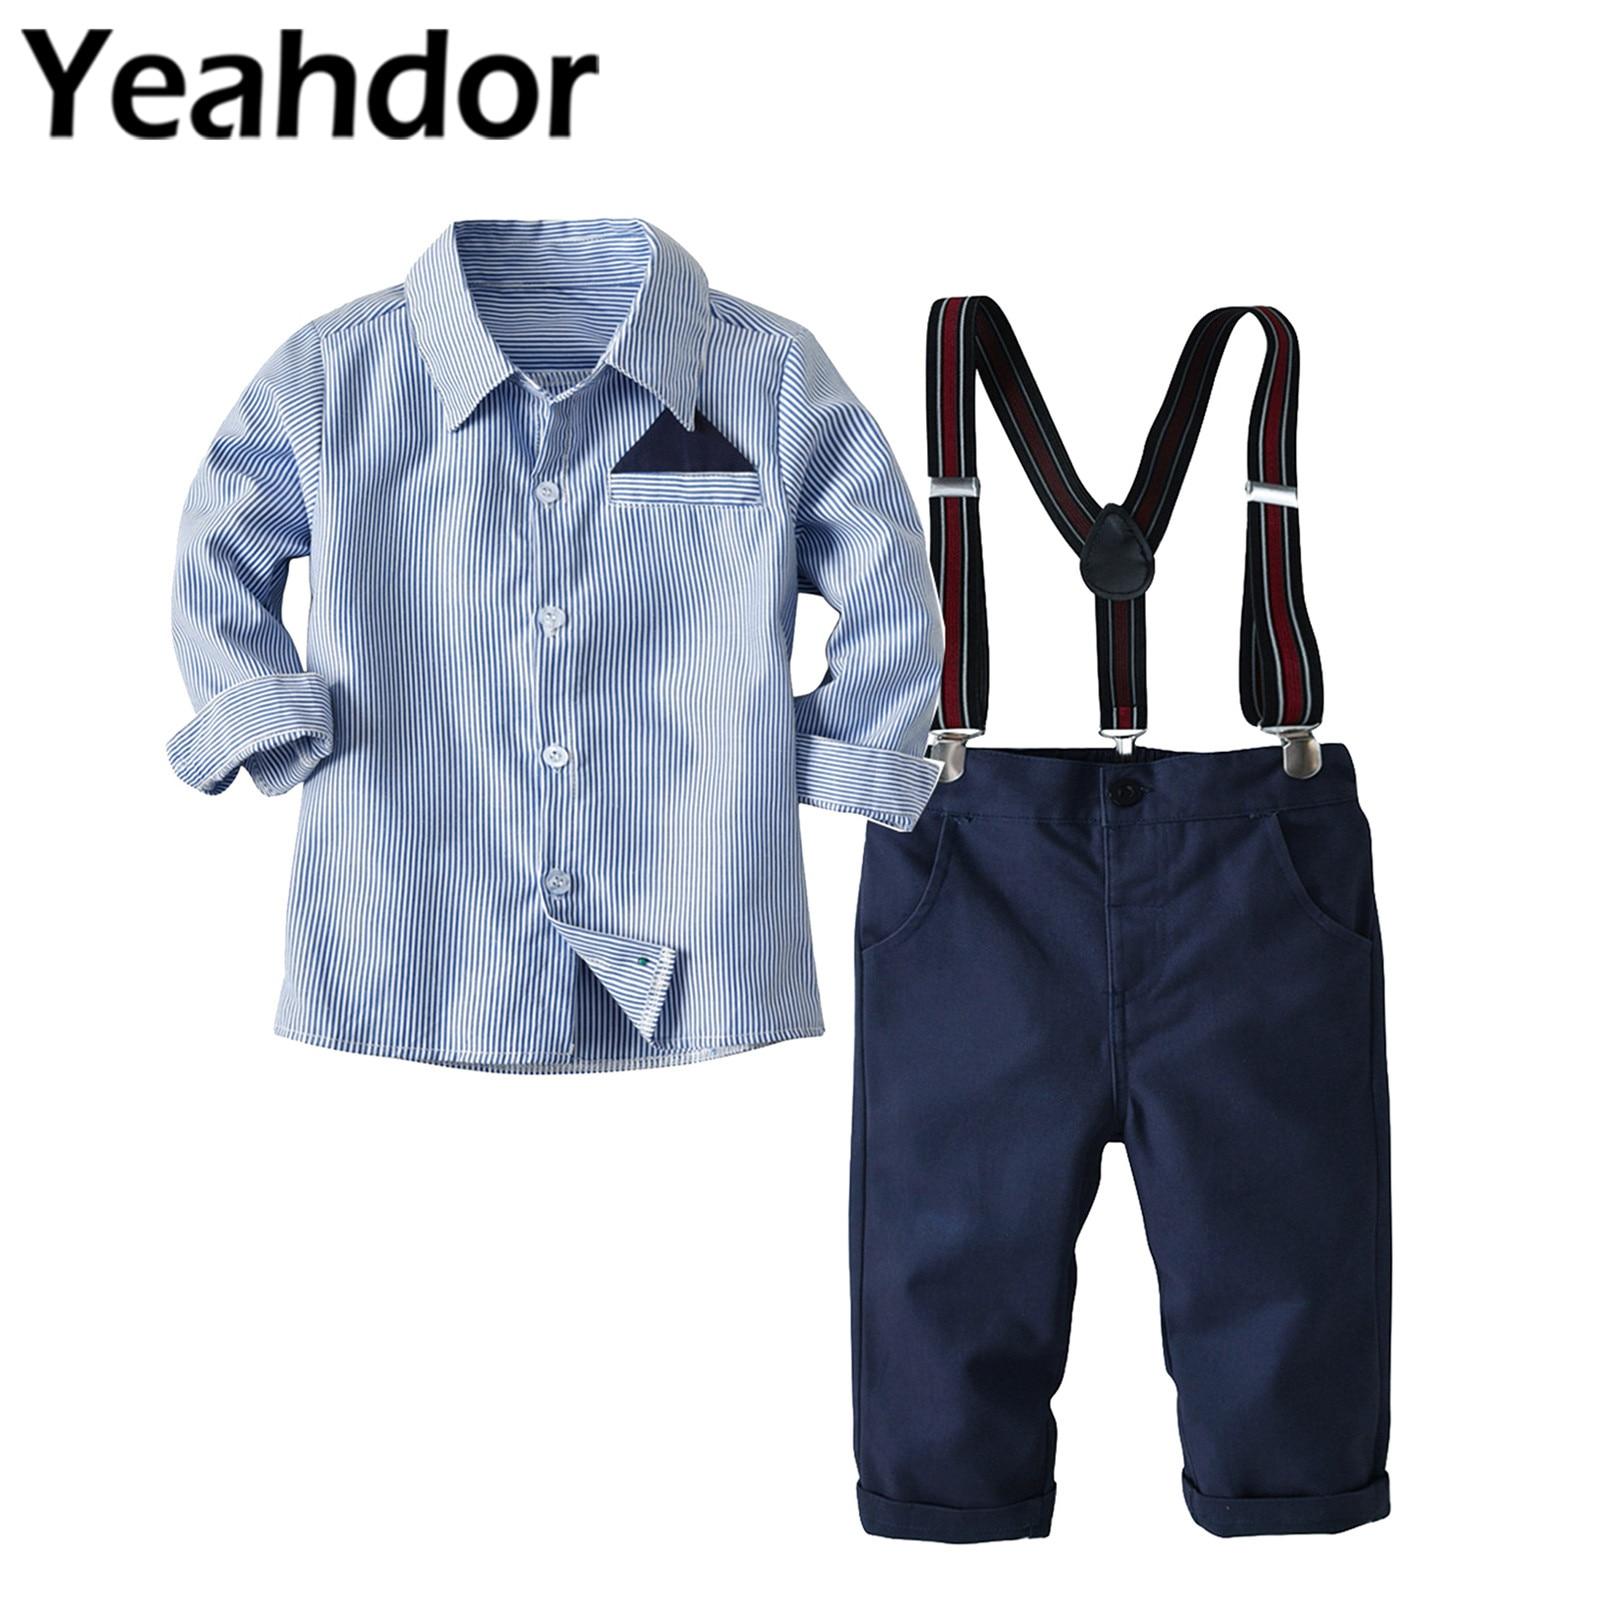 2Pcs Kids Clothes Set Flower Boys Wedding Suits Children's Gentleman Outfits Suits for Boy Long Sleeve Shirt Pants Party Costume